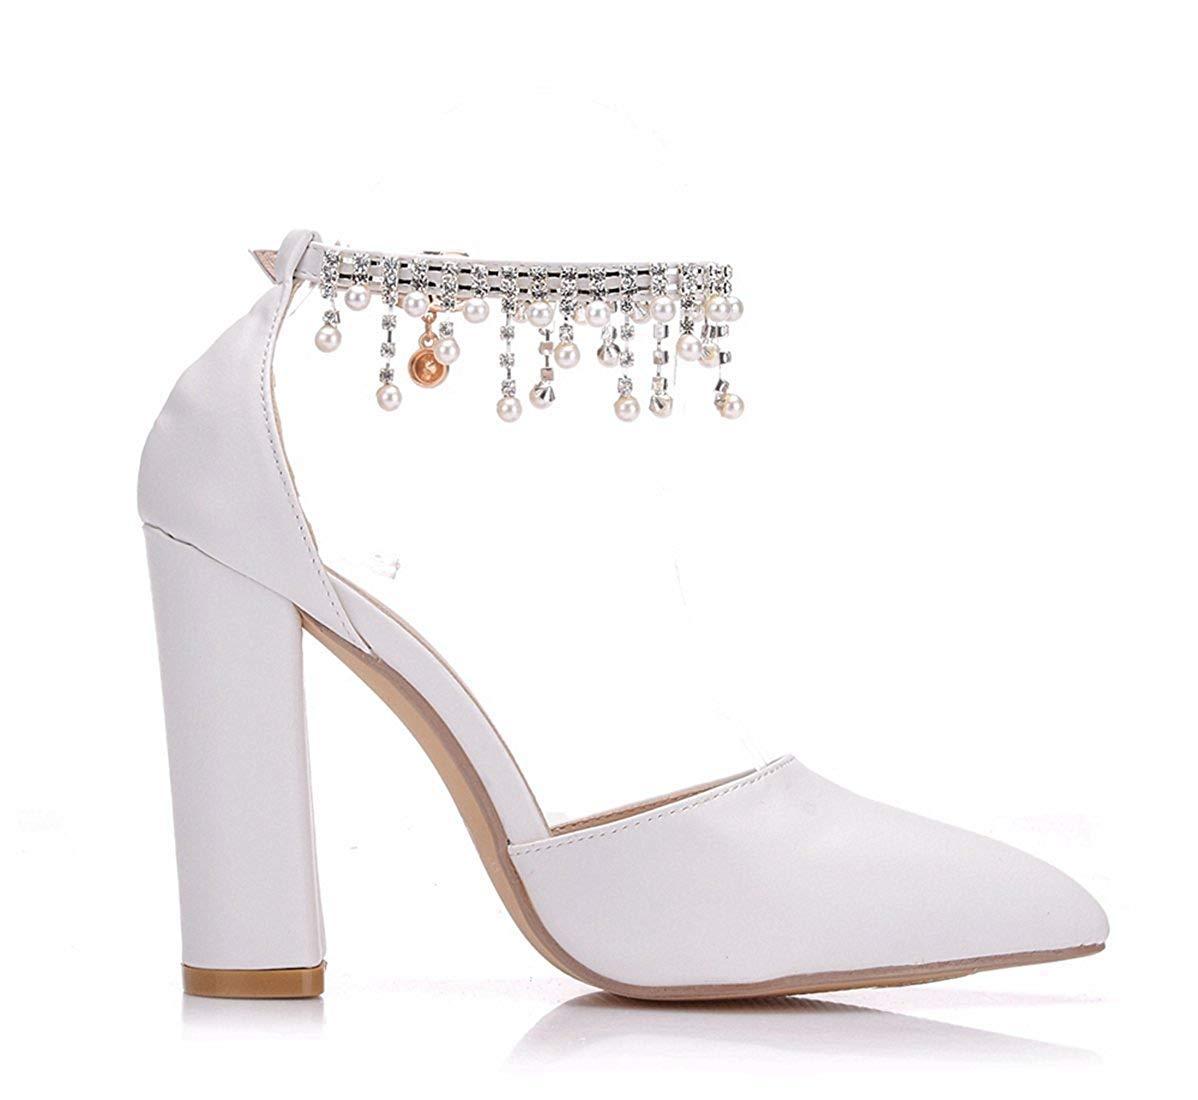 Qiusa Damen Knöchel-Ketten Knöchel-Ketten Knöchel-Ketten Chunky High Heel Weiß Satin Braut Hochzeit Mode Pumps UK 3.5 (Farbe   -, Größe   -) aa007b